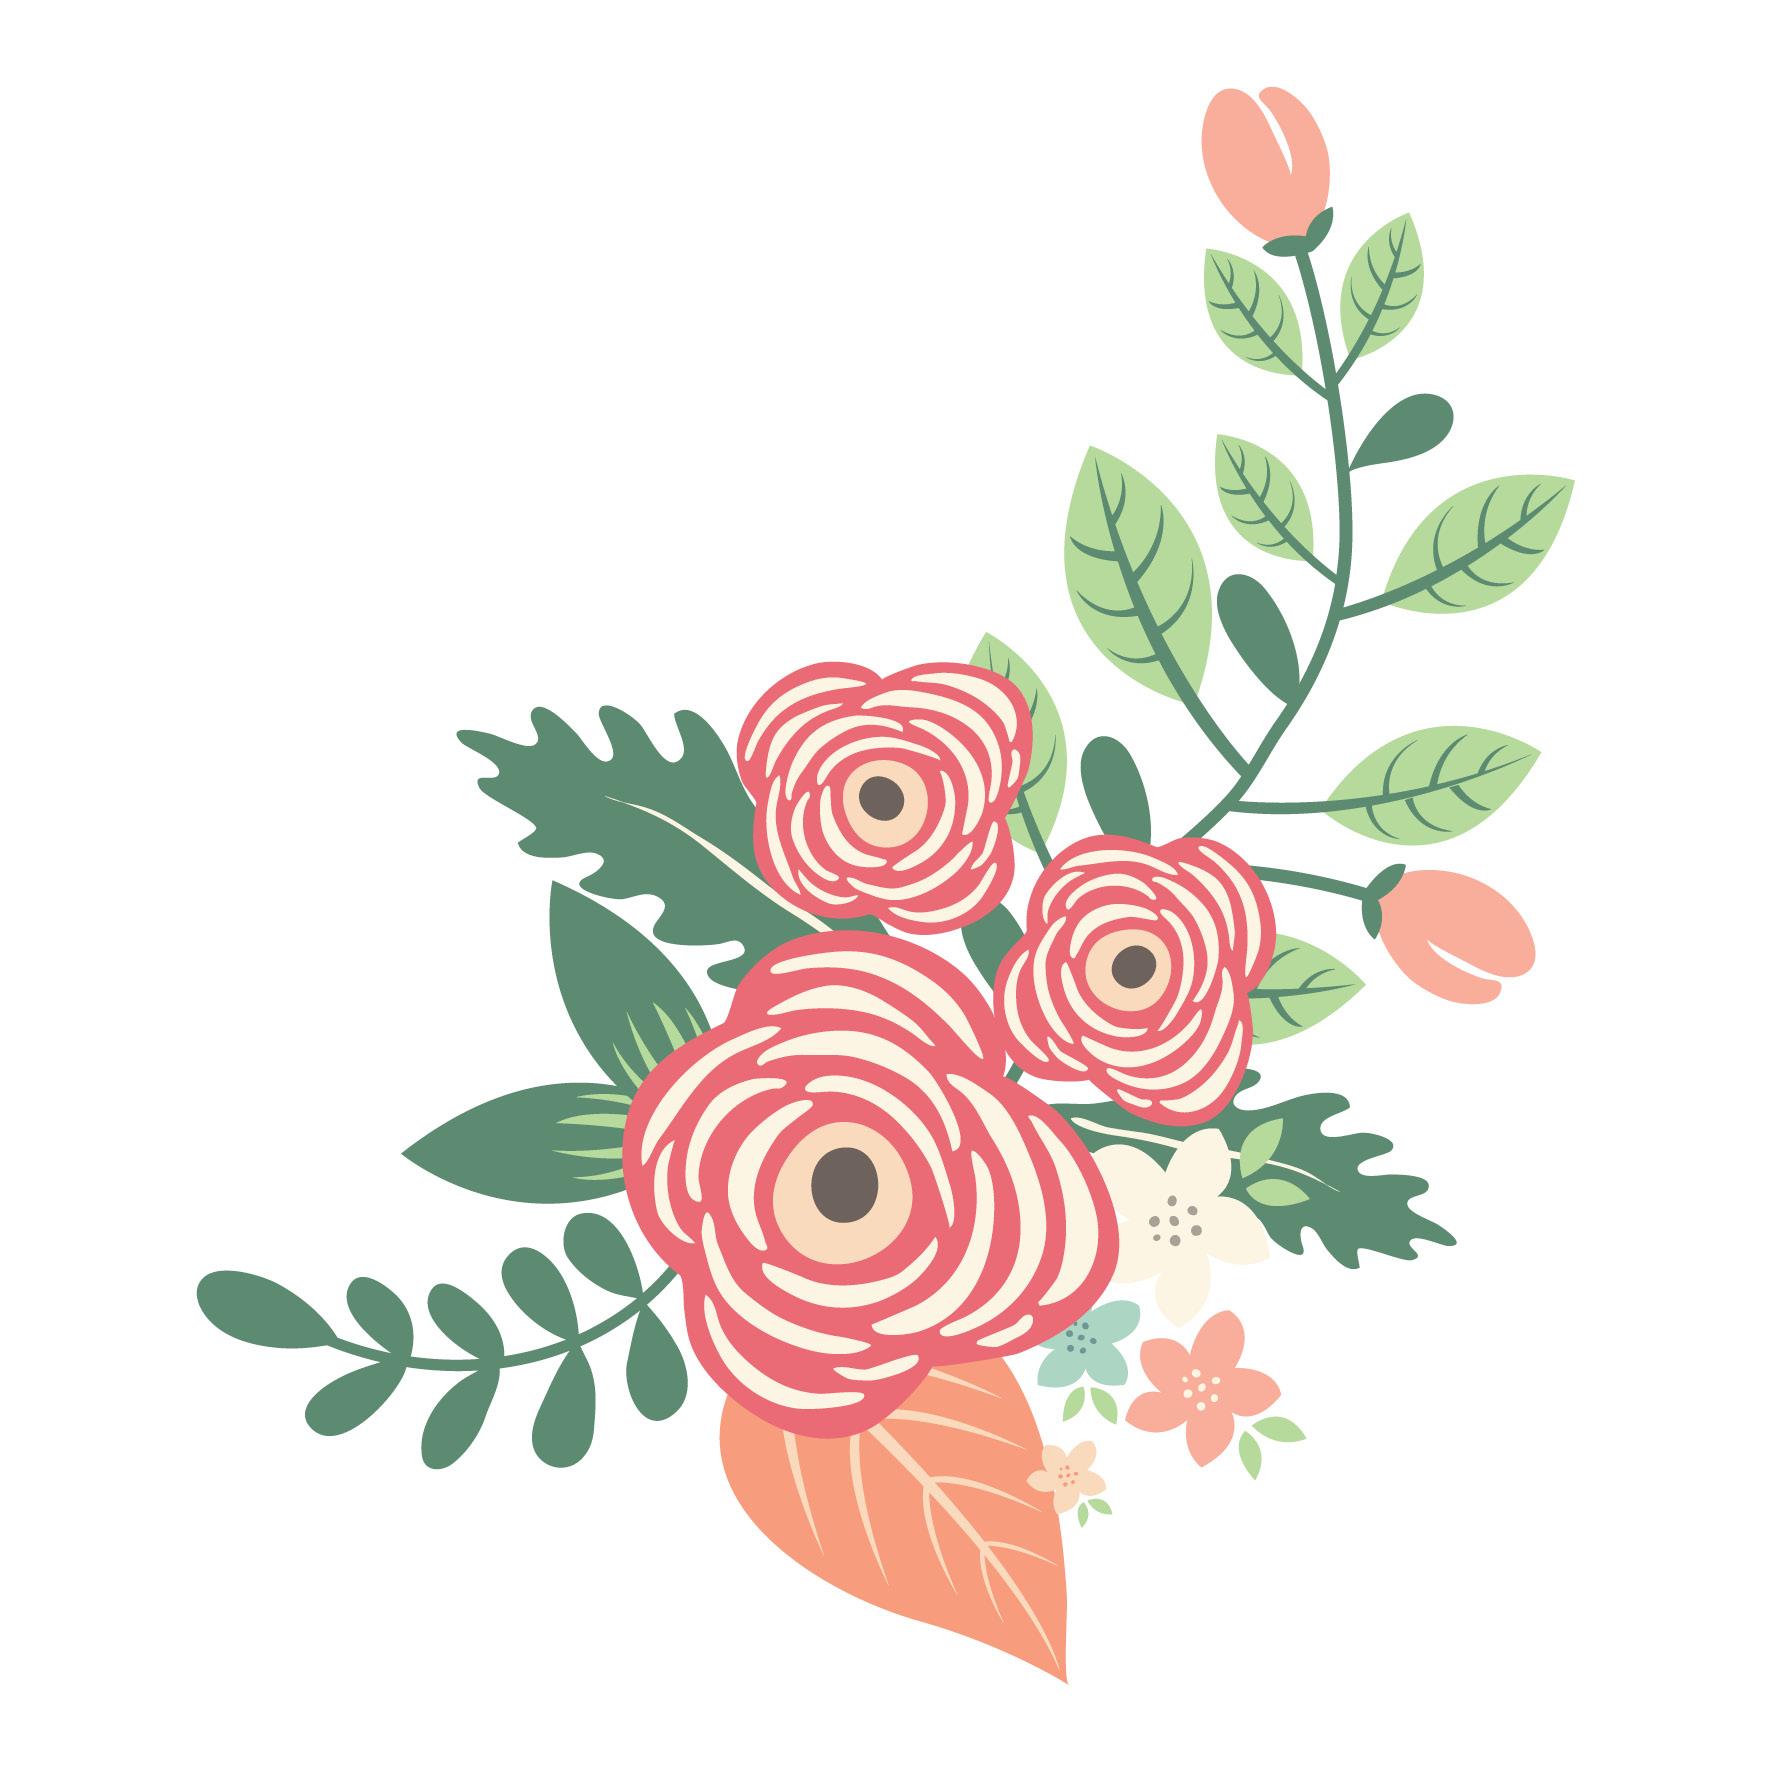 SMLC_Flower_RGB